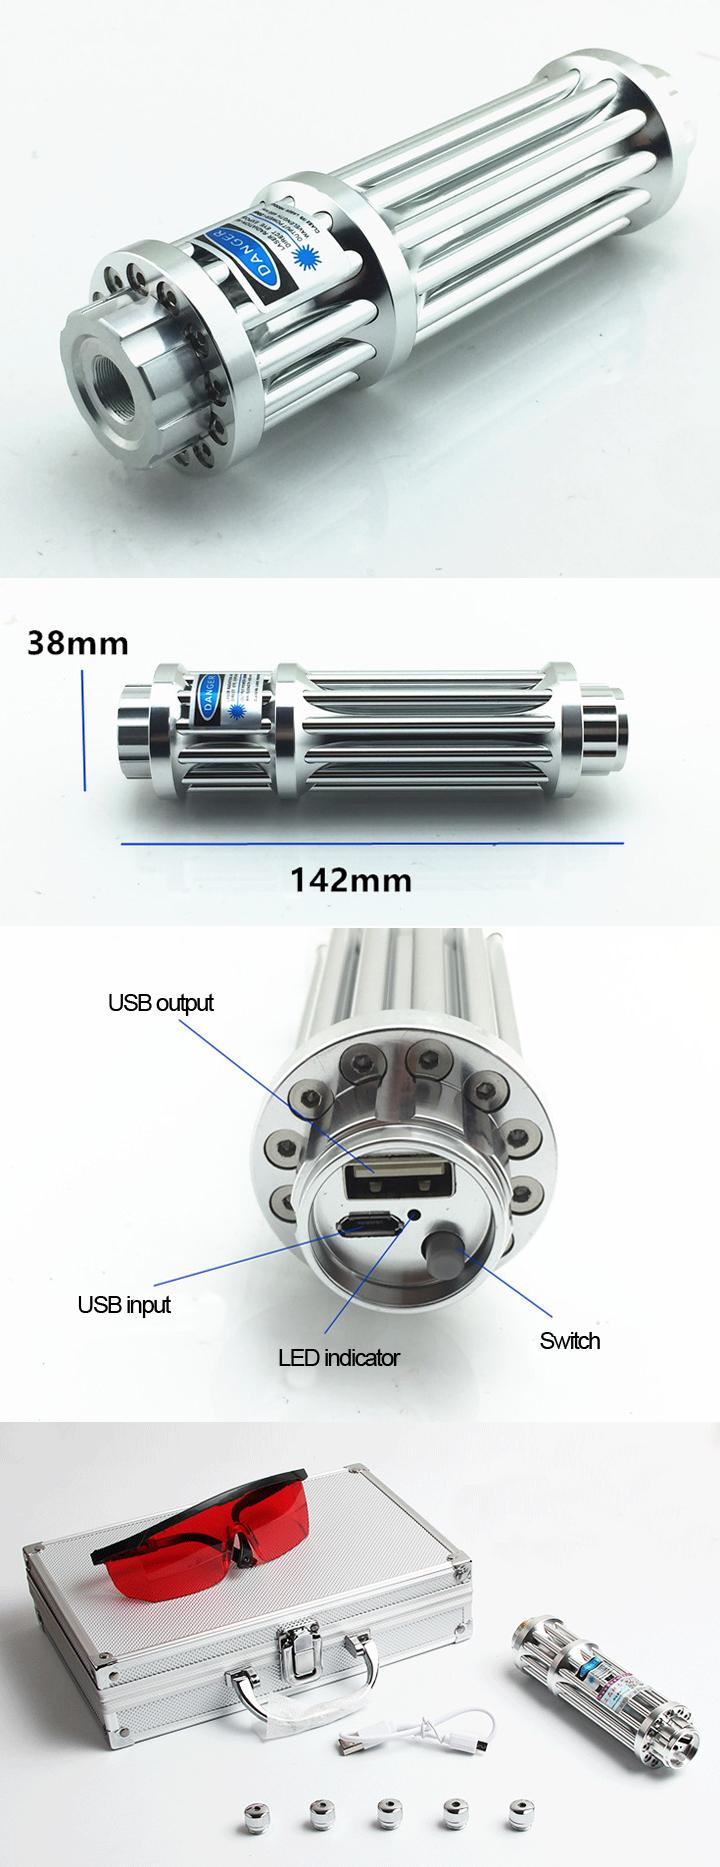 USB laser pointer